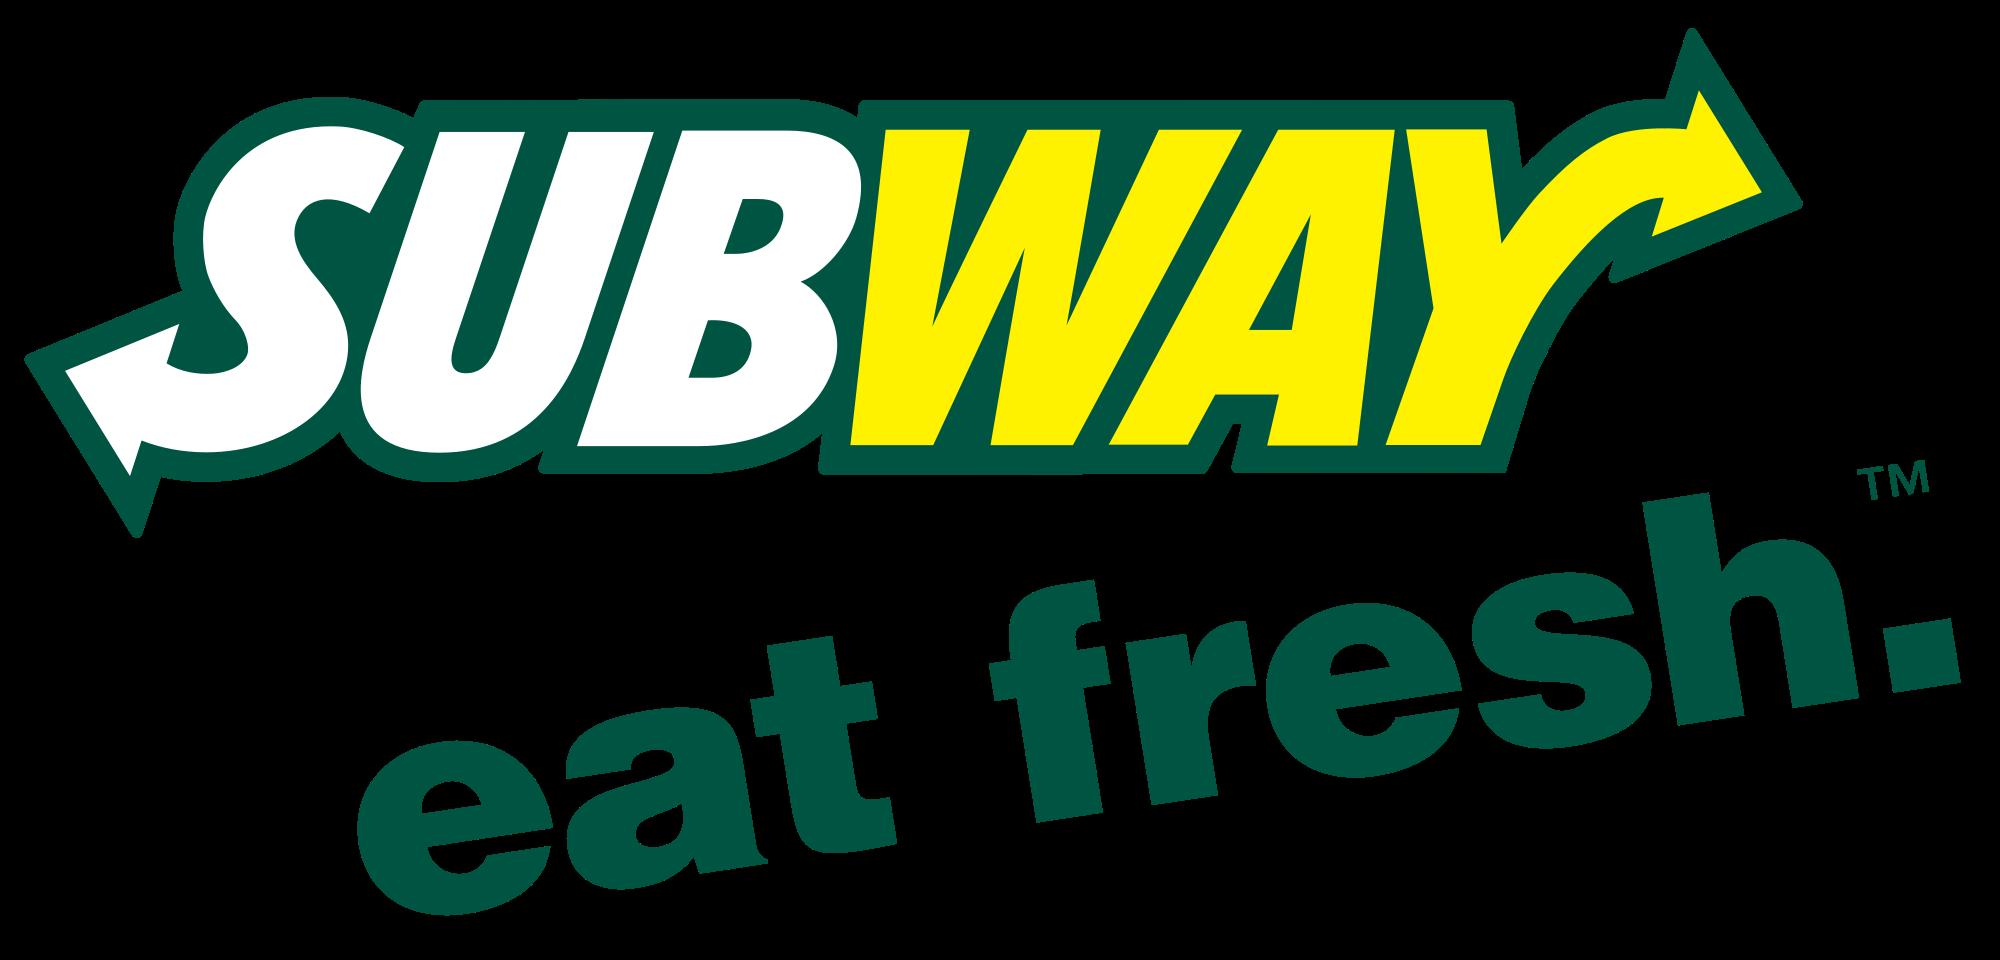 Logo clipart restaurant. File subway svg wikimedia